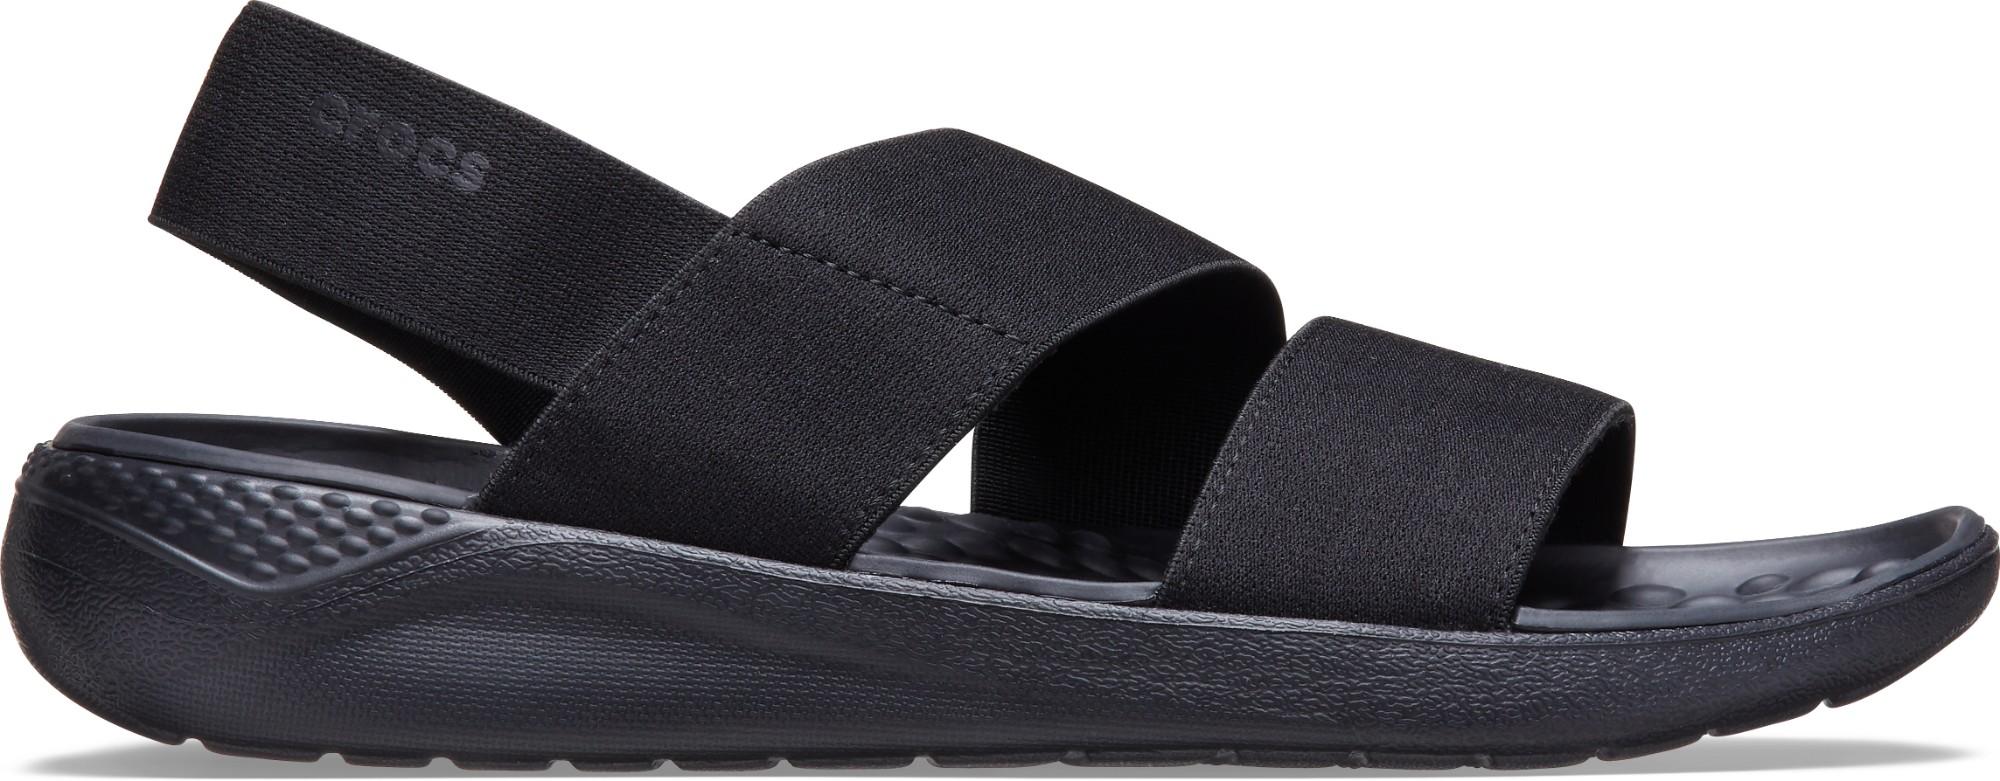 Crocs™ Literide Stretch Sandal Womens Black/Black 37,5